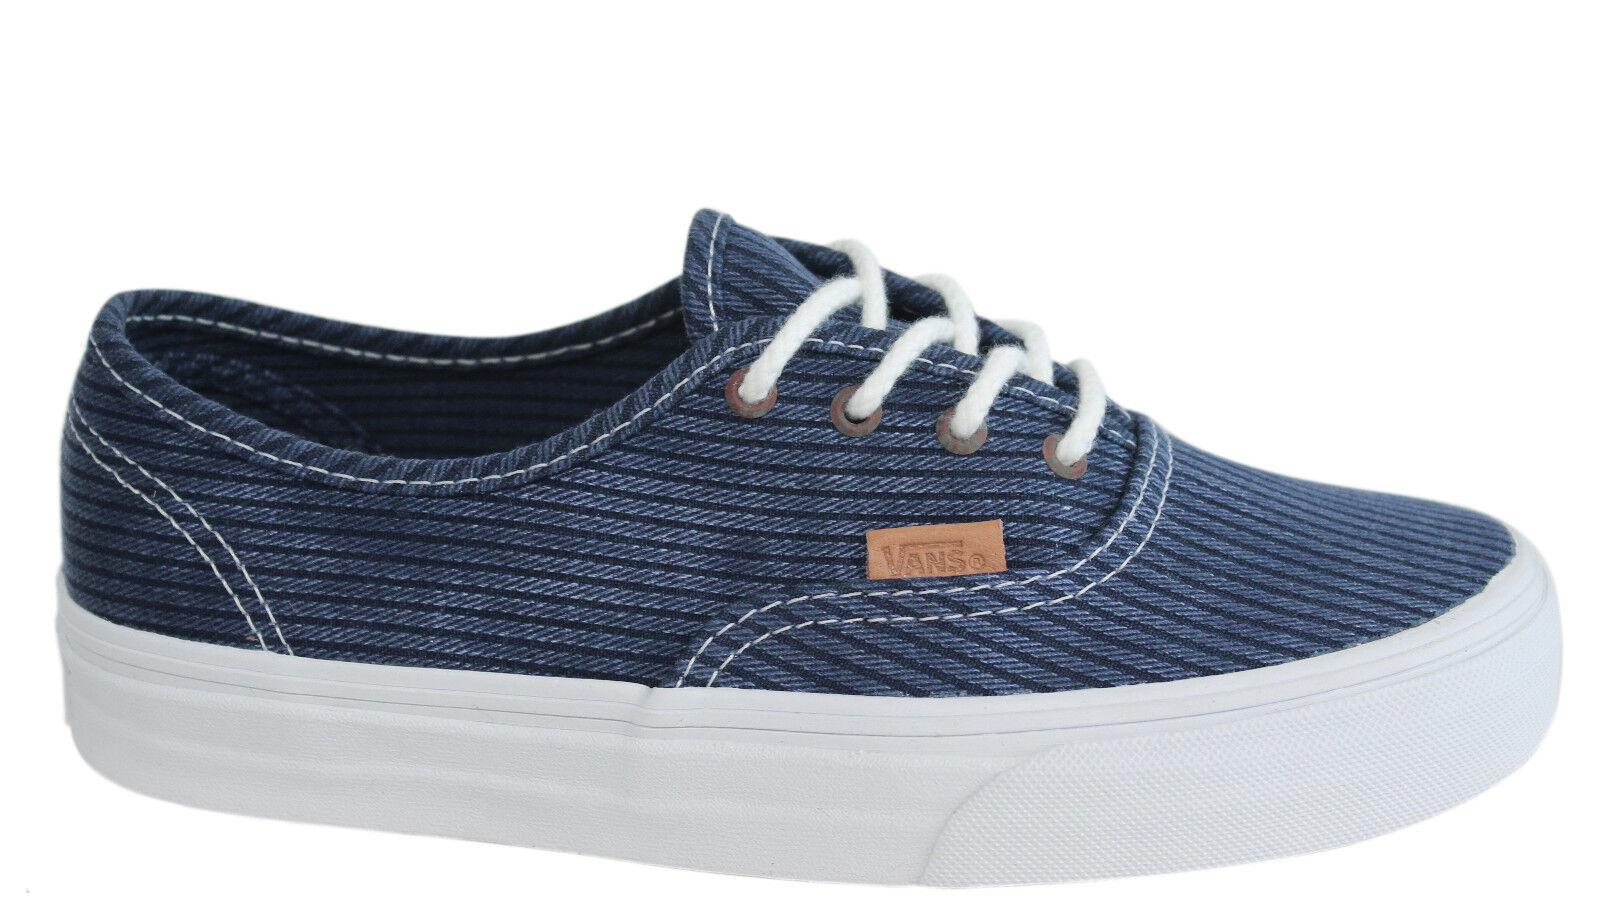 Vans Authentic Washed Herringbone Lace Up Bleu Unisex Plimsolls ZUIFQS Vans C